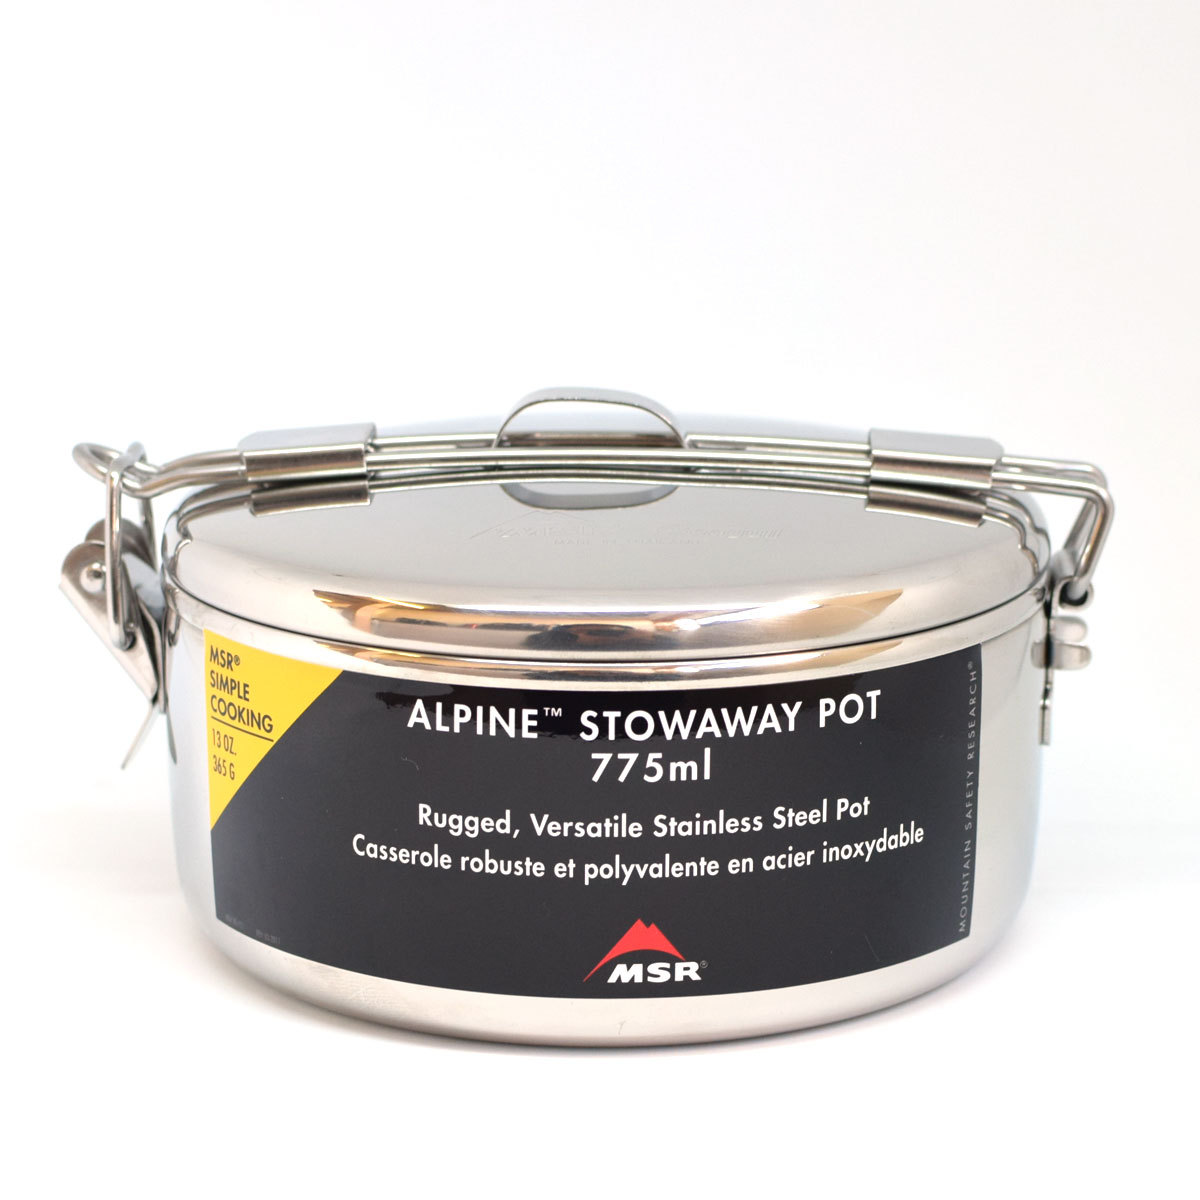 MSR ALPINE STOWAWAY POTS アルパインストアウェイポット 775cc